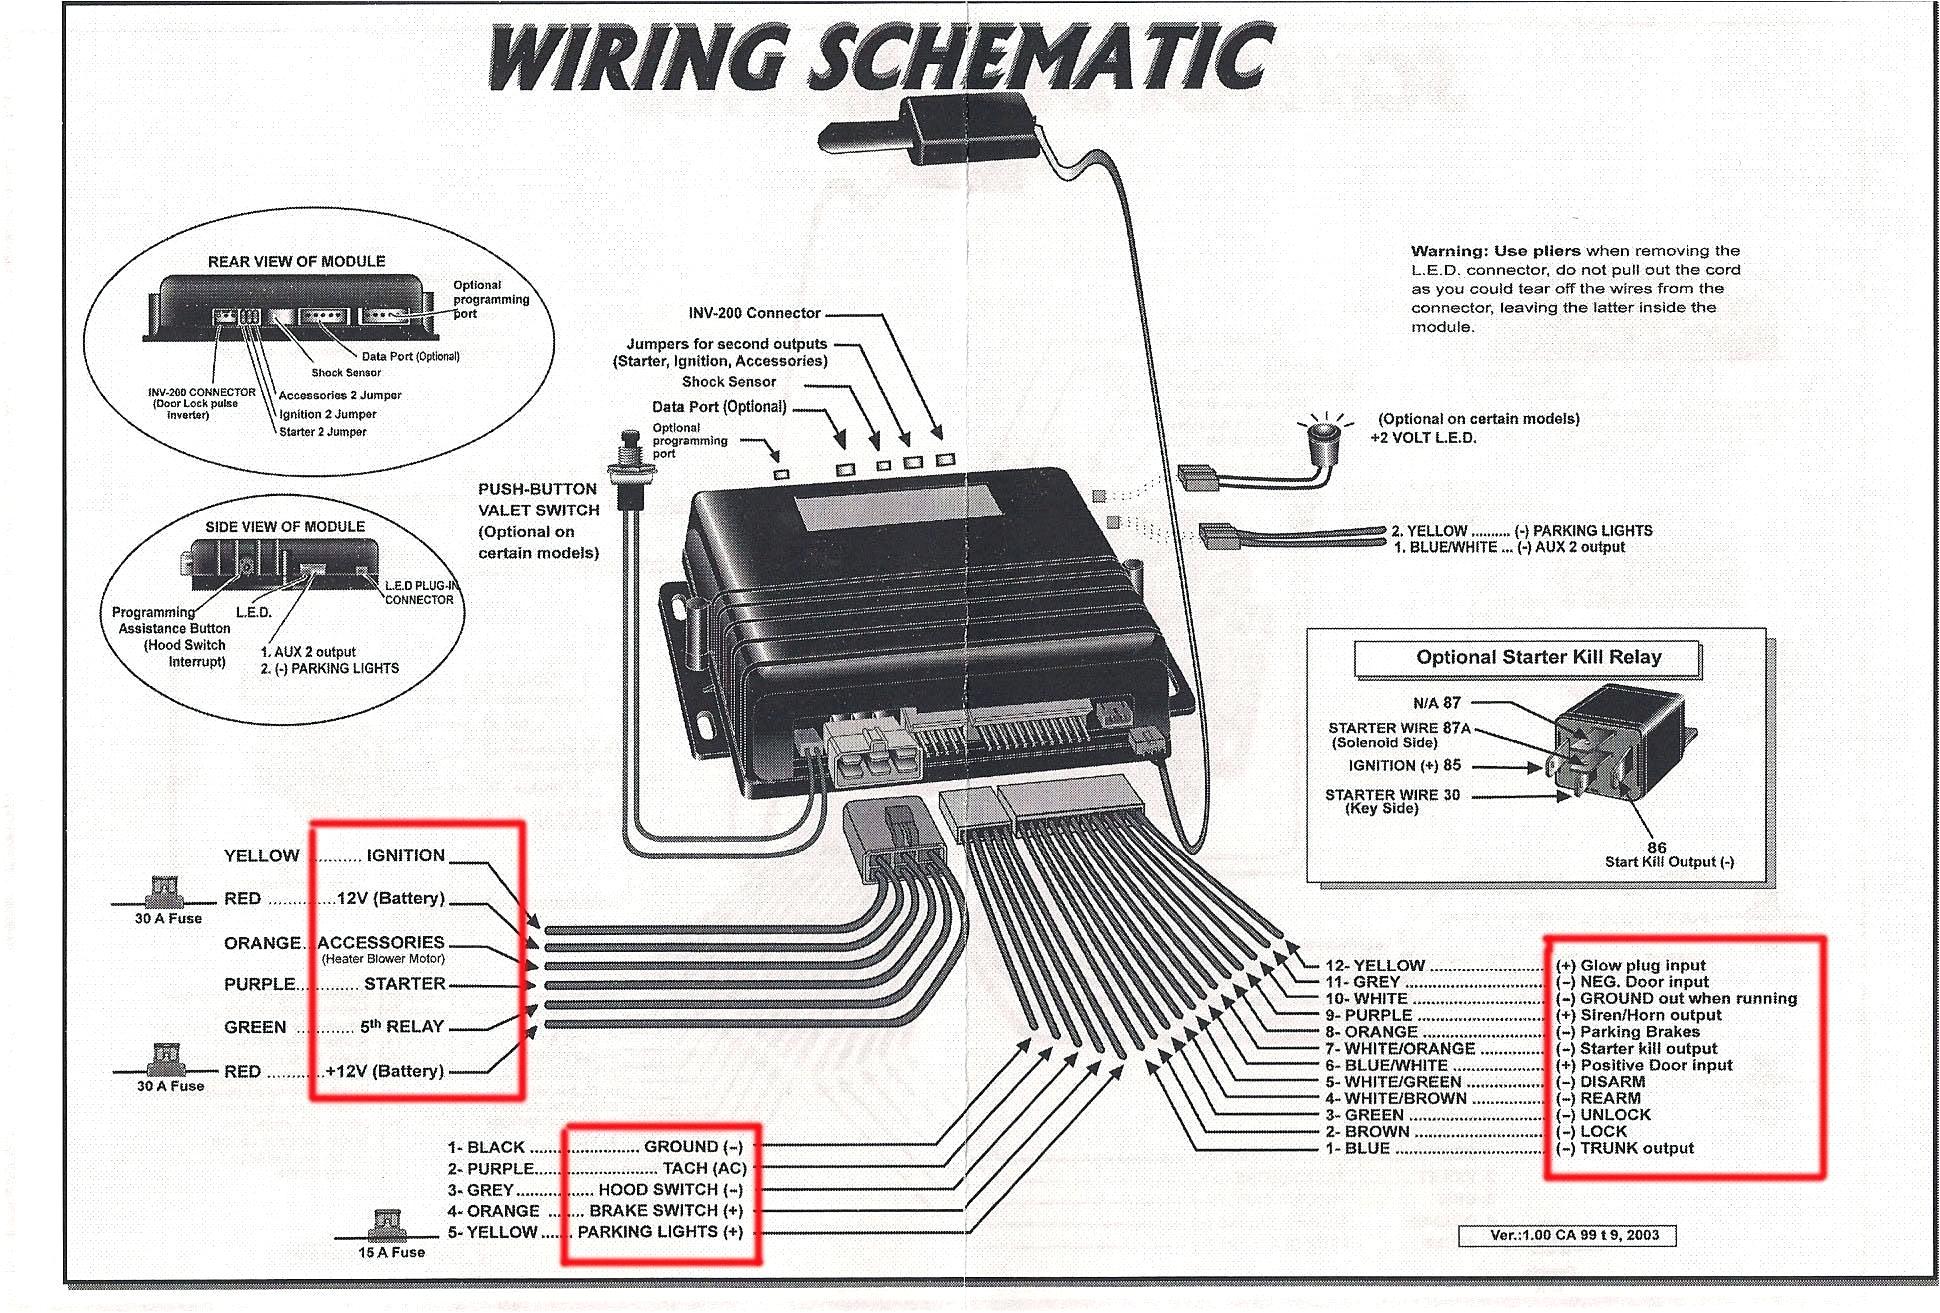 avital remote starter wiring diagram wiring diagrams bib bulldog security remote start wiring diagram avital wiring